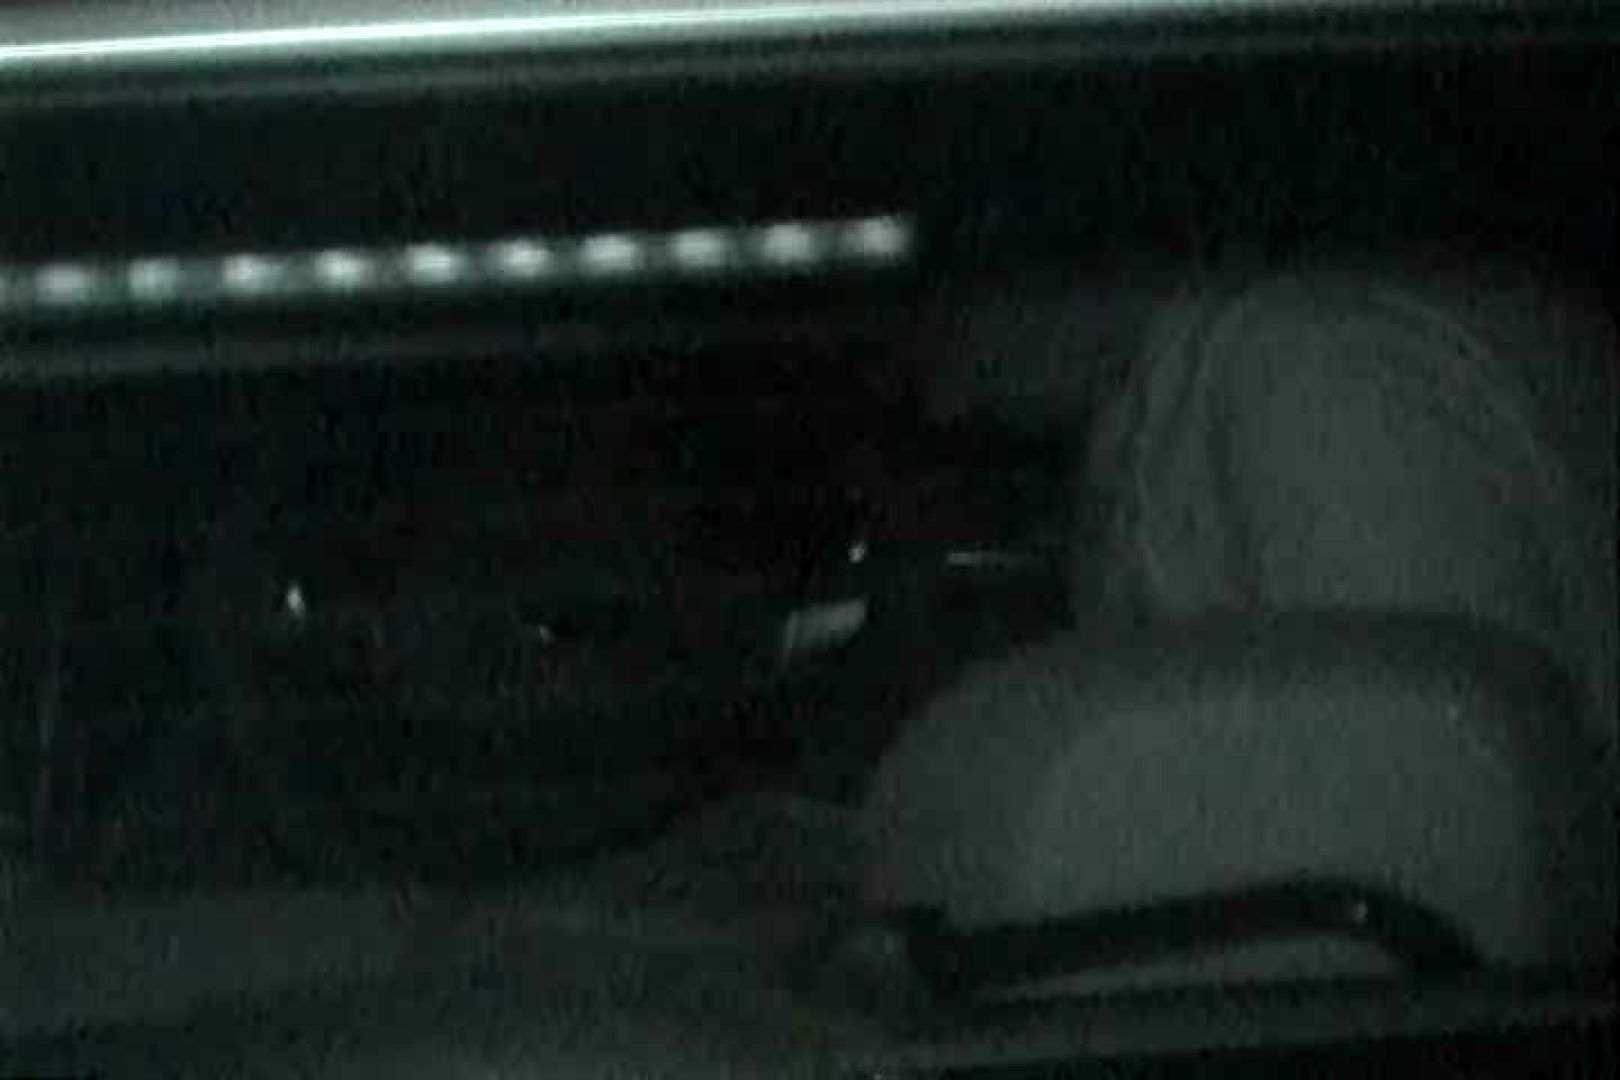 充血監督の深夜の運動会Vol.124 車 オメコ無修正動画無料 63画像 4